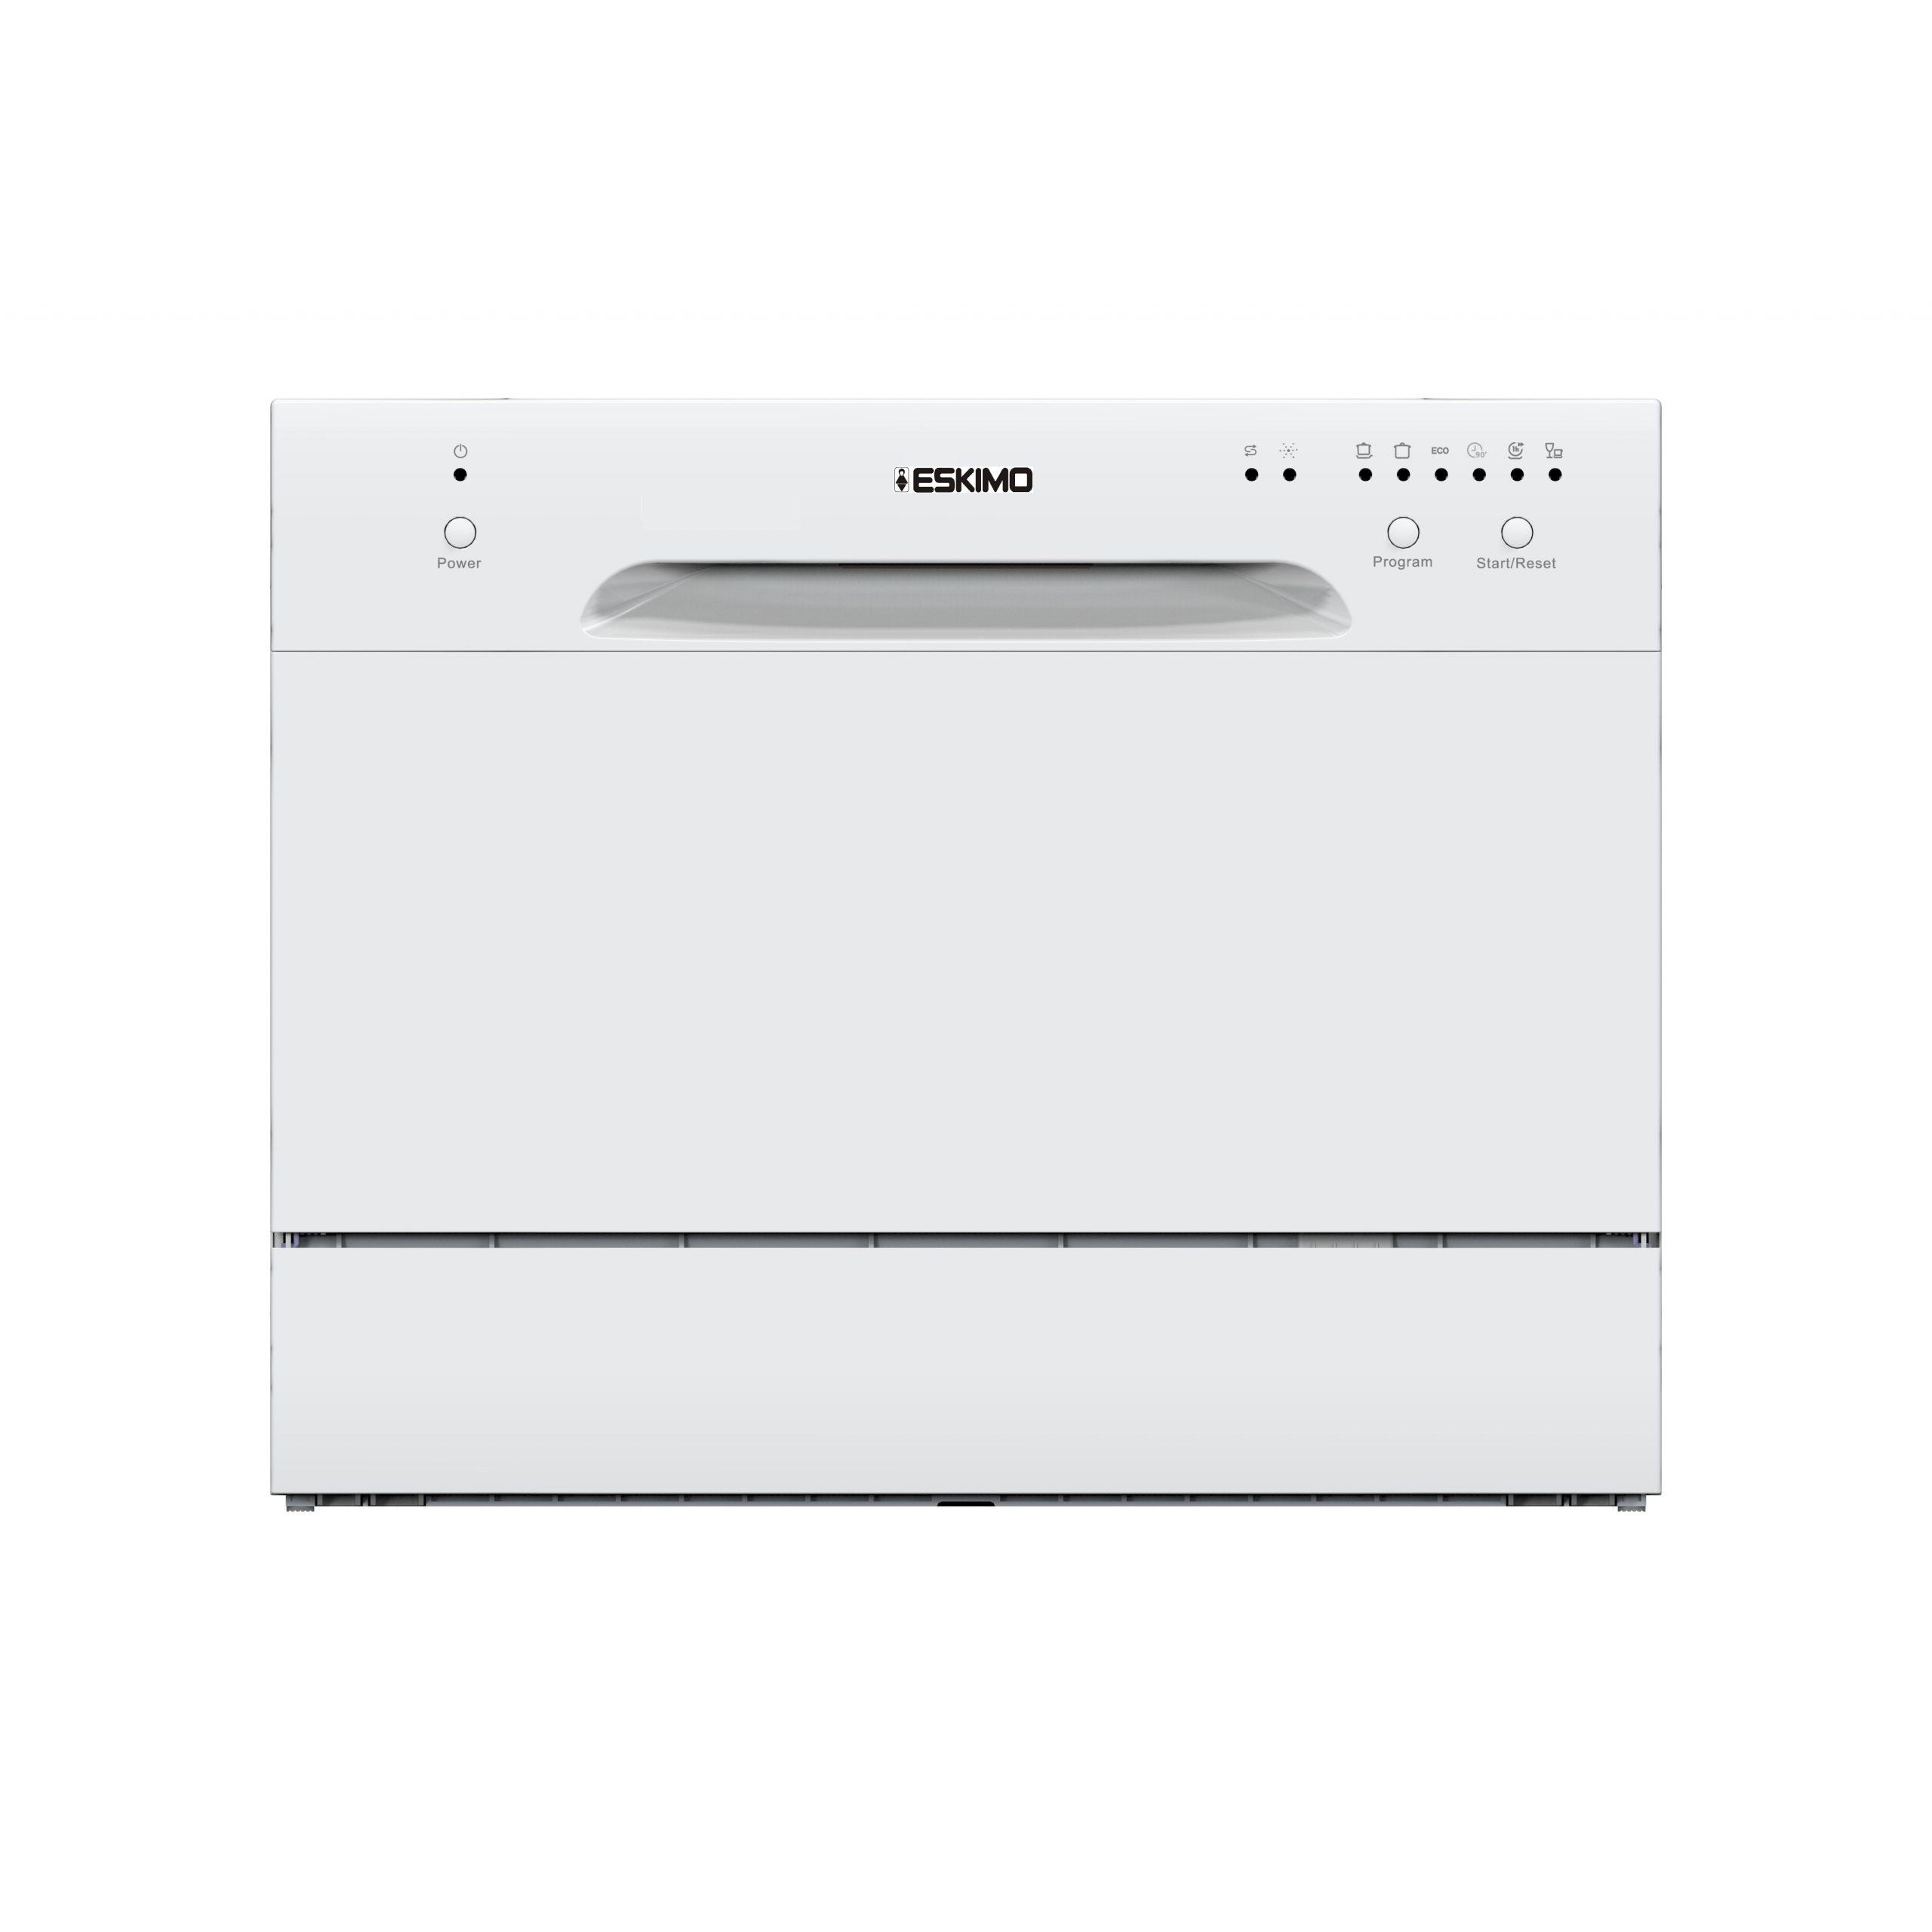 Eskimo Πλυντήριο Πιάτων ES 605 DW